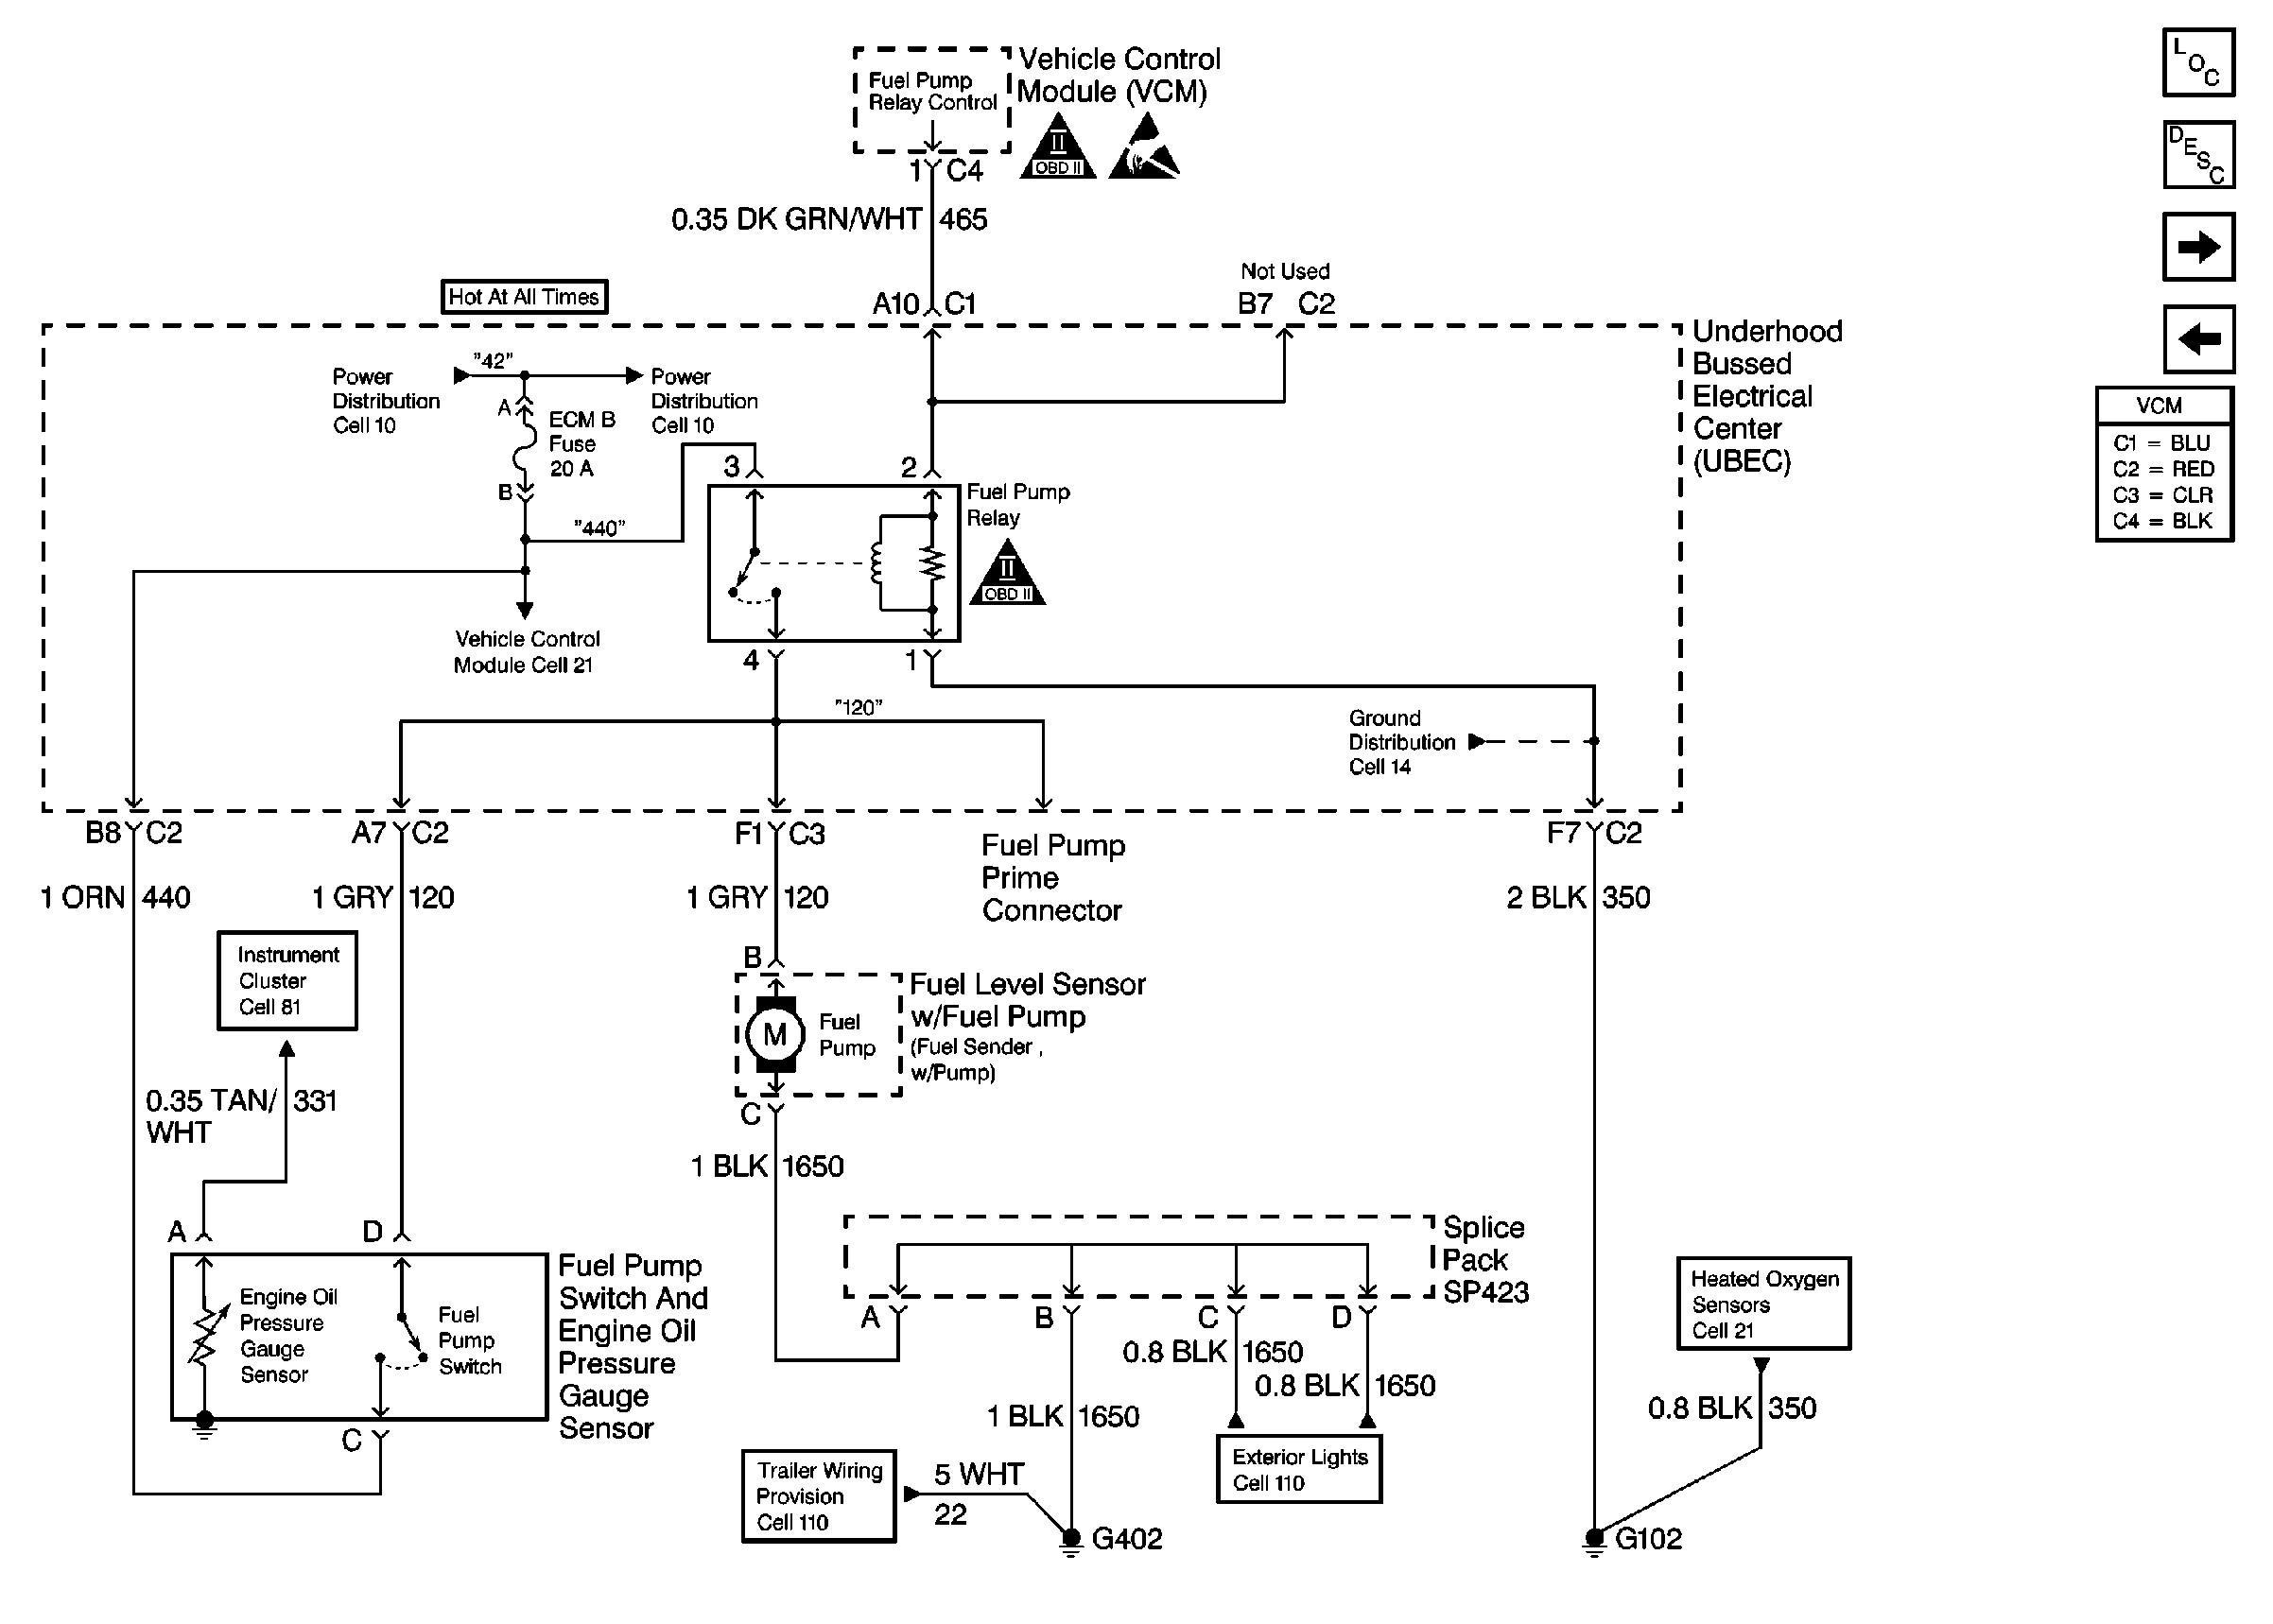 11 pin ice cube relay wiring diagram wiring diagram11 pin ice cube relay wiring diagram